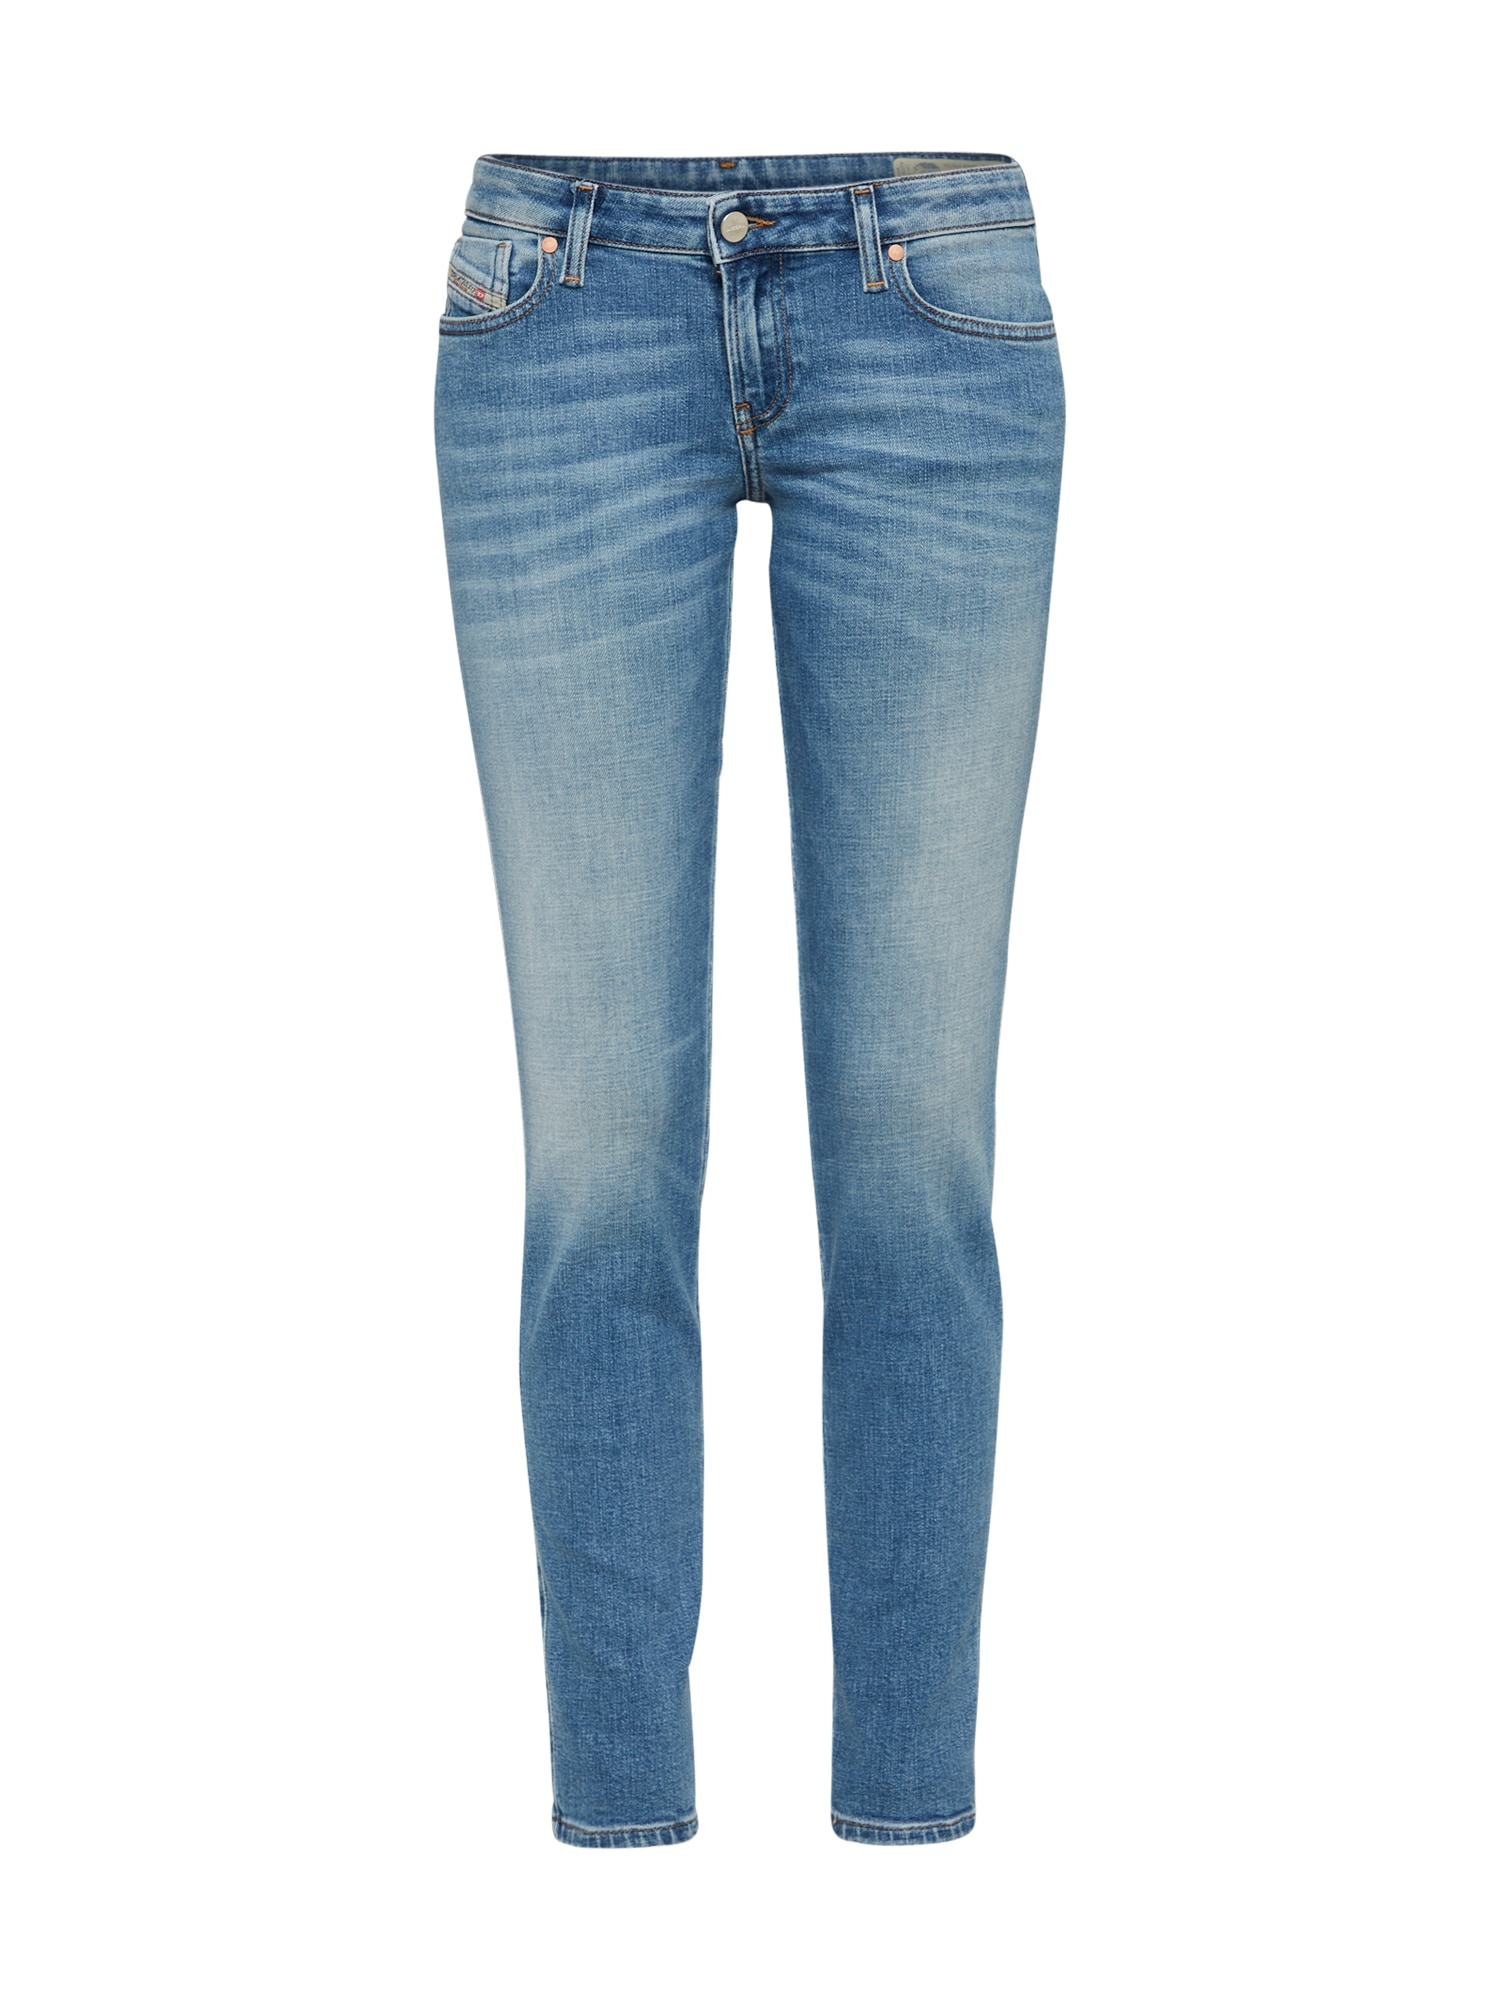 DIESEL Dames Jeans Gracey Skinny Jeans 084GL blauw denim